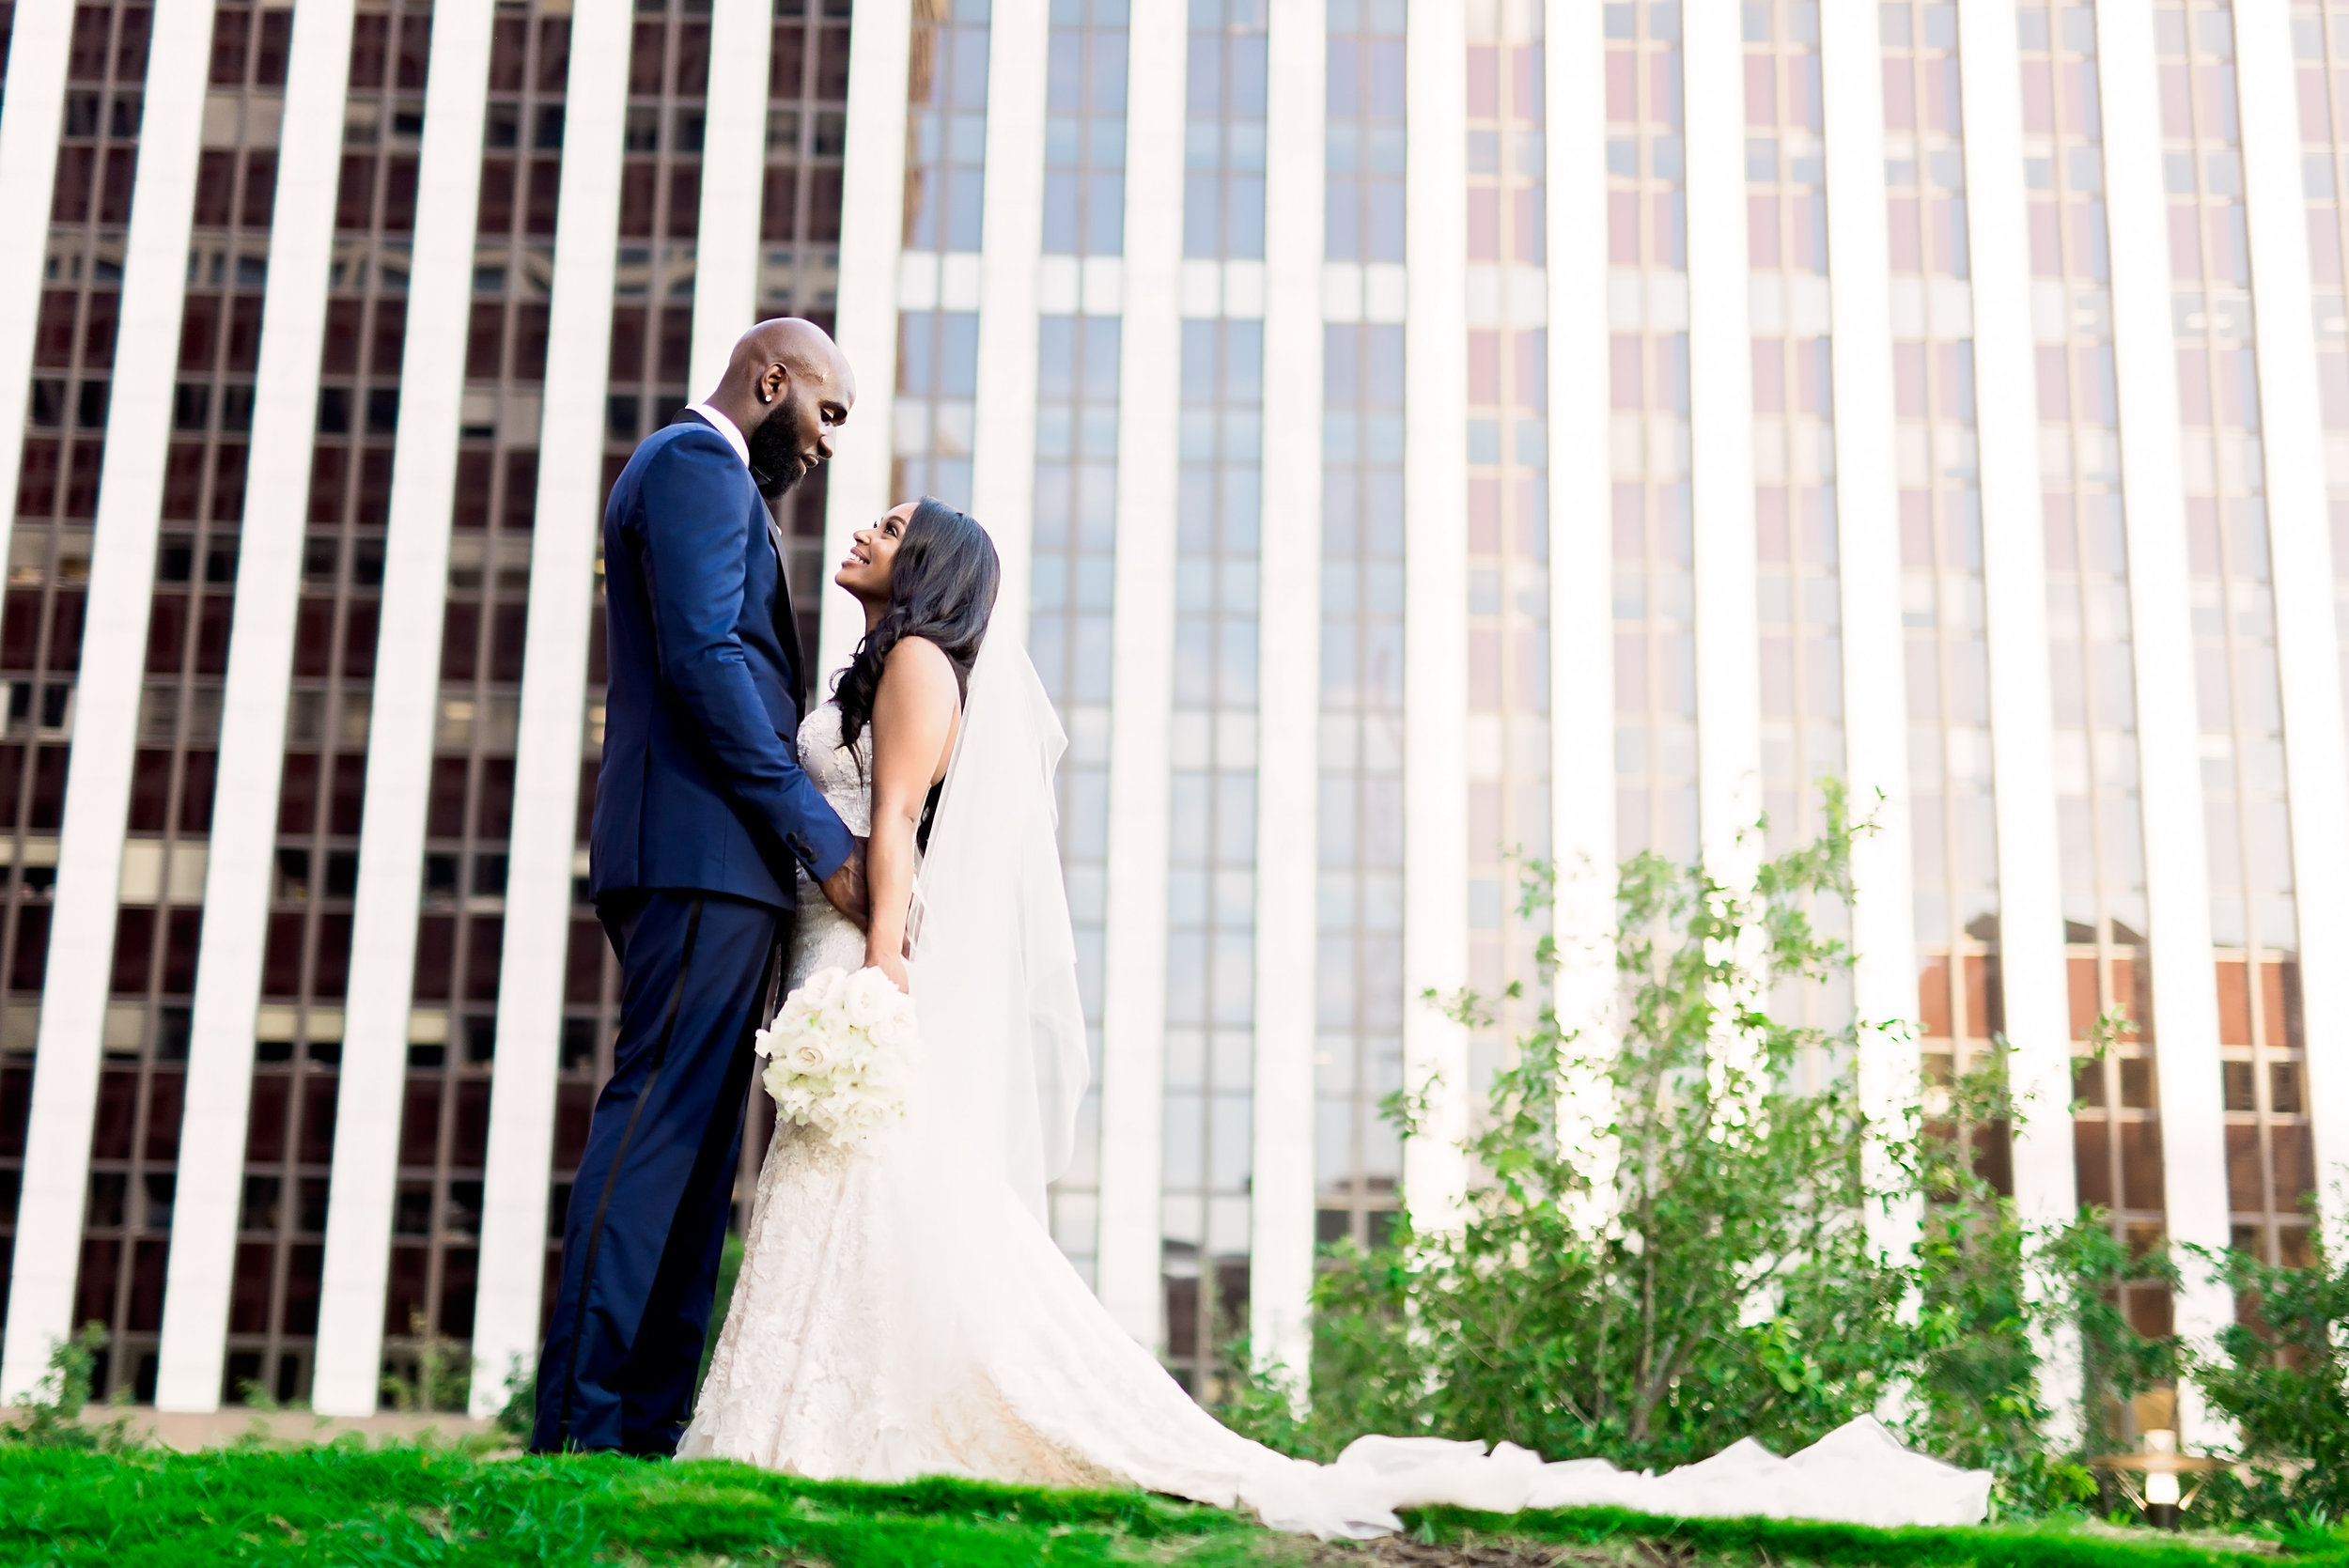 Enchanting-Wedding-Jessica-Quincy-Pharris-Photos77.jpg